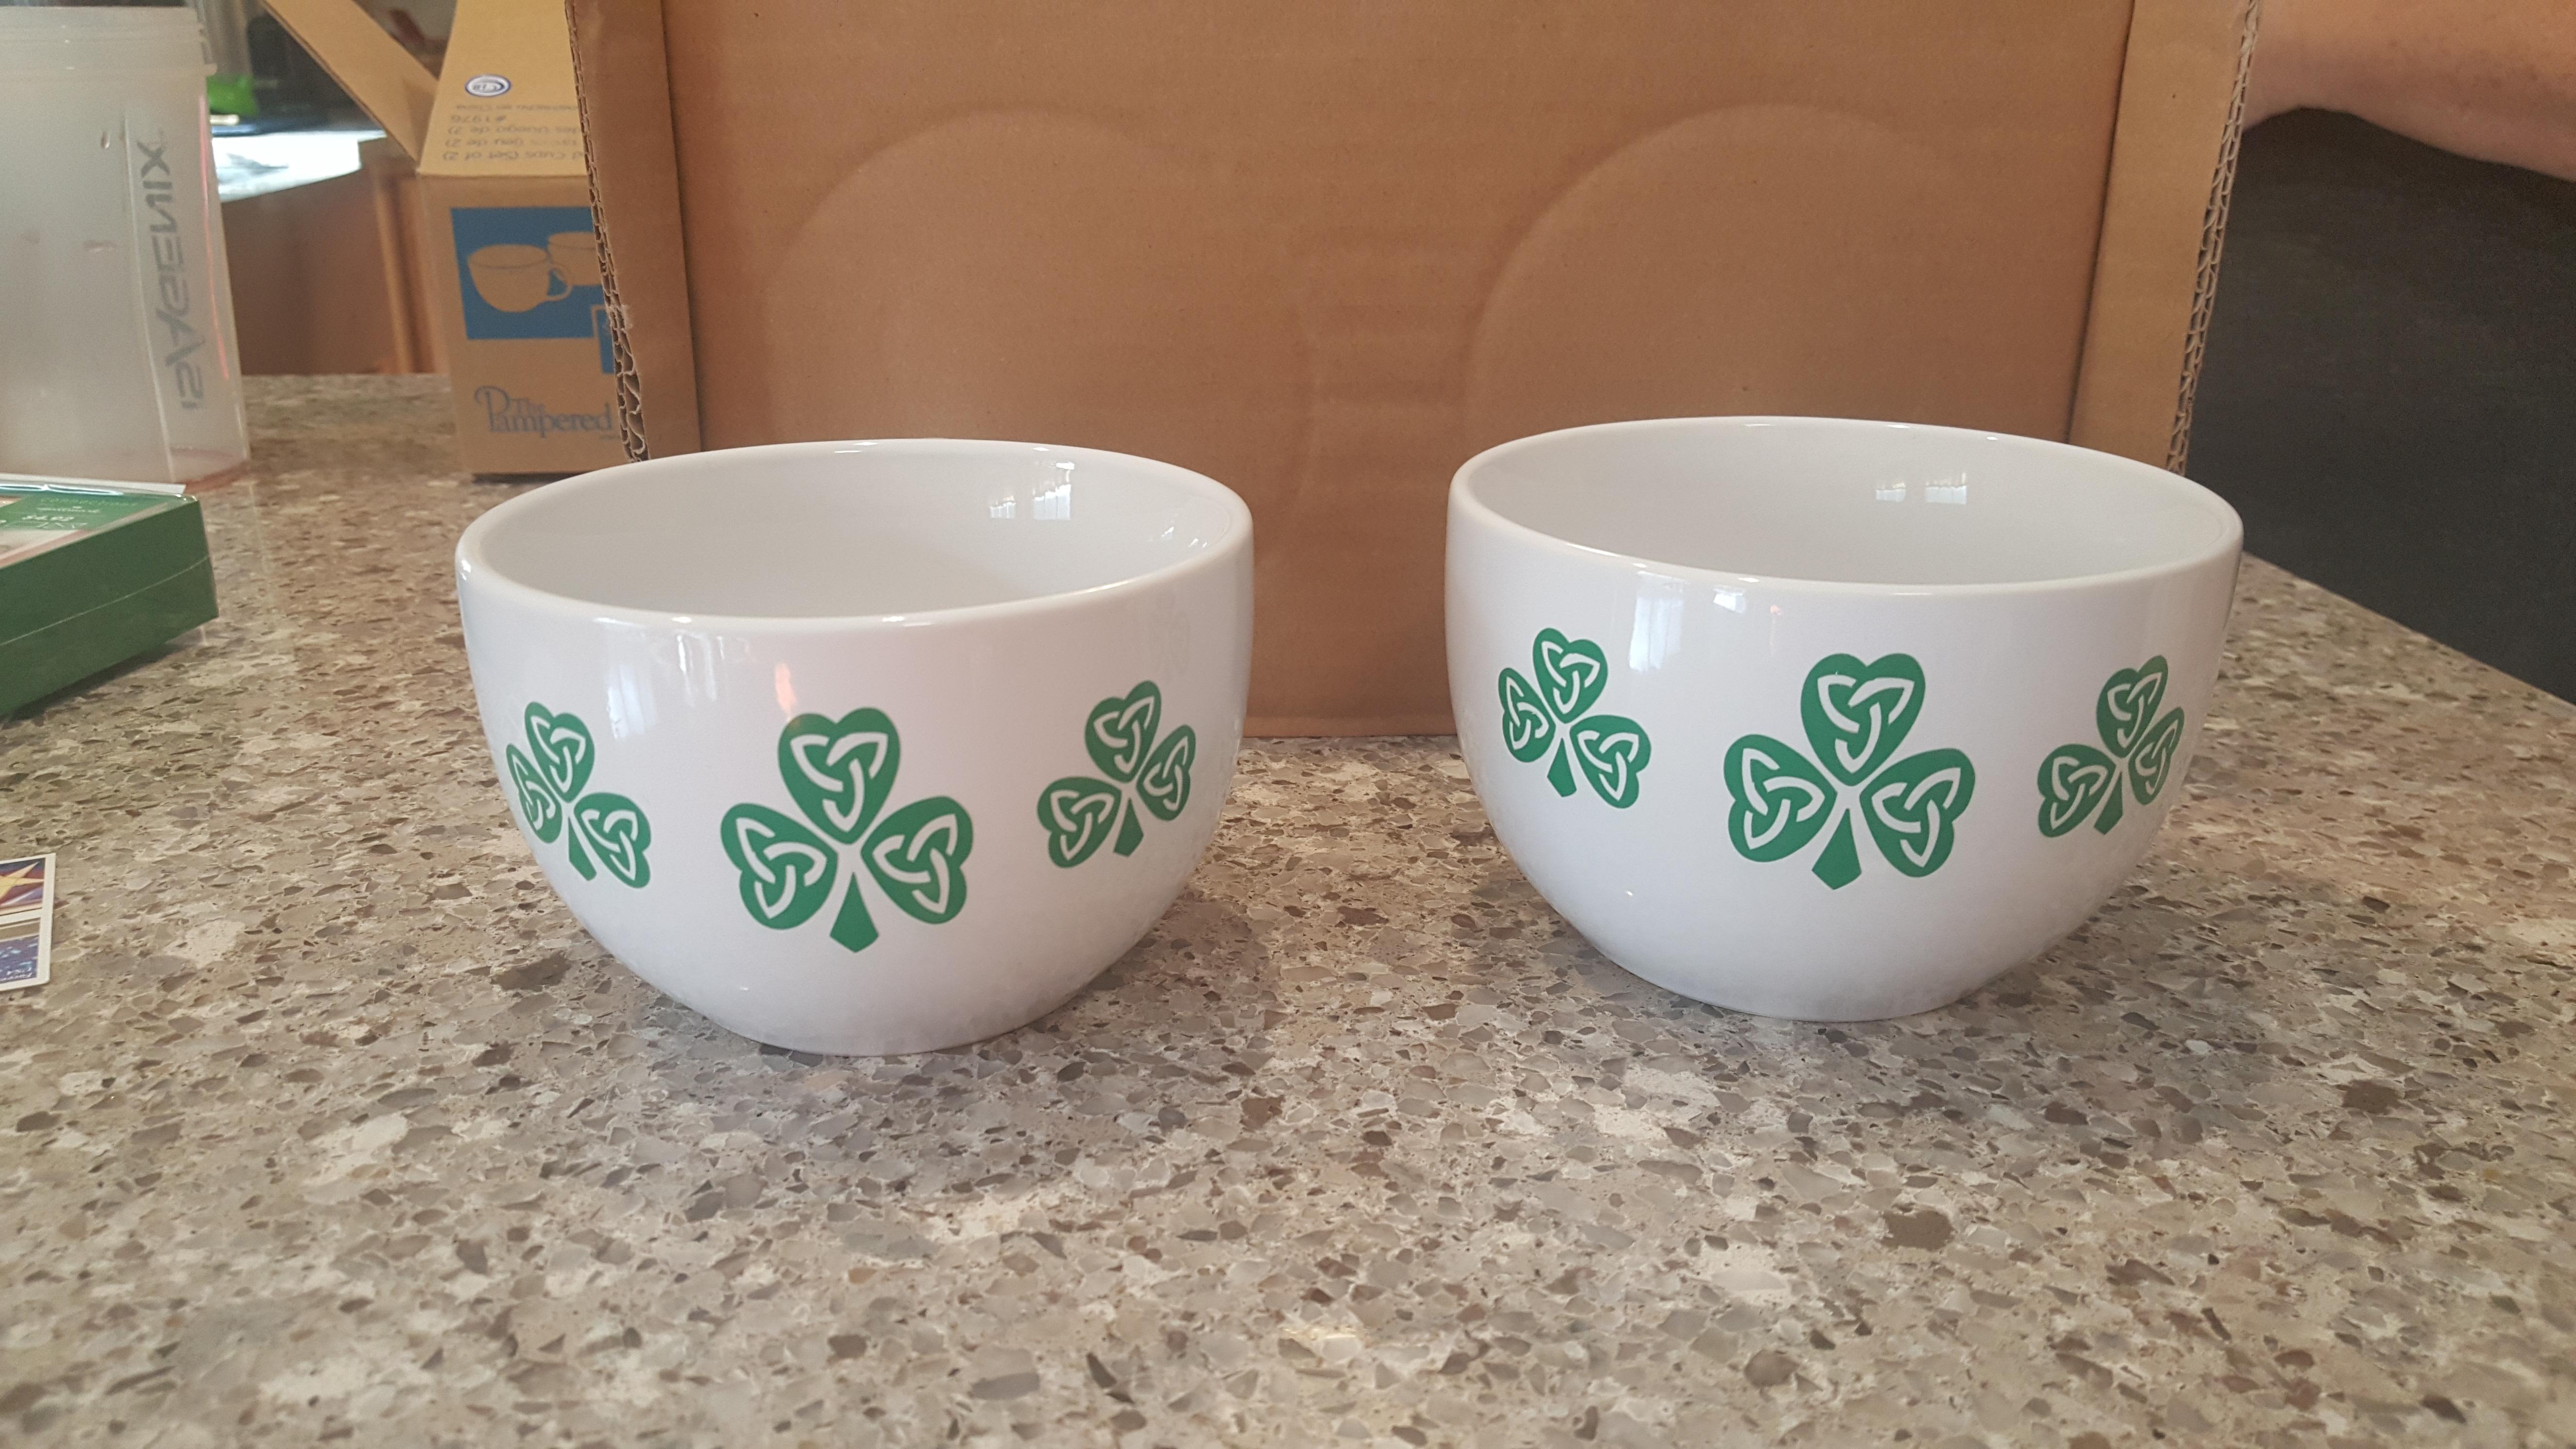 Shamrock cups